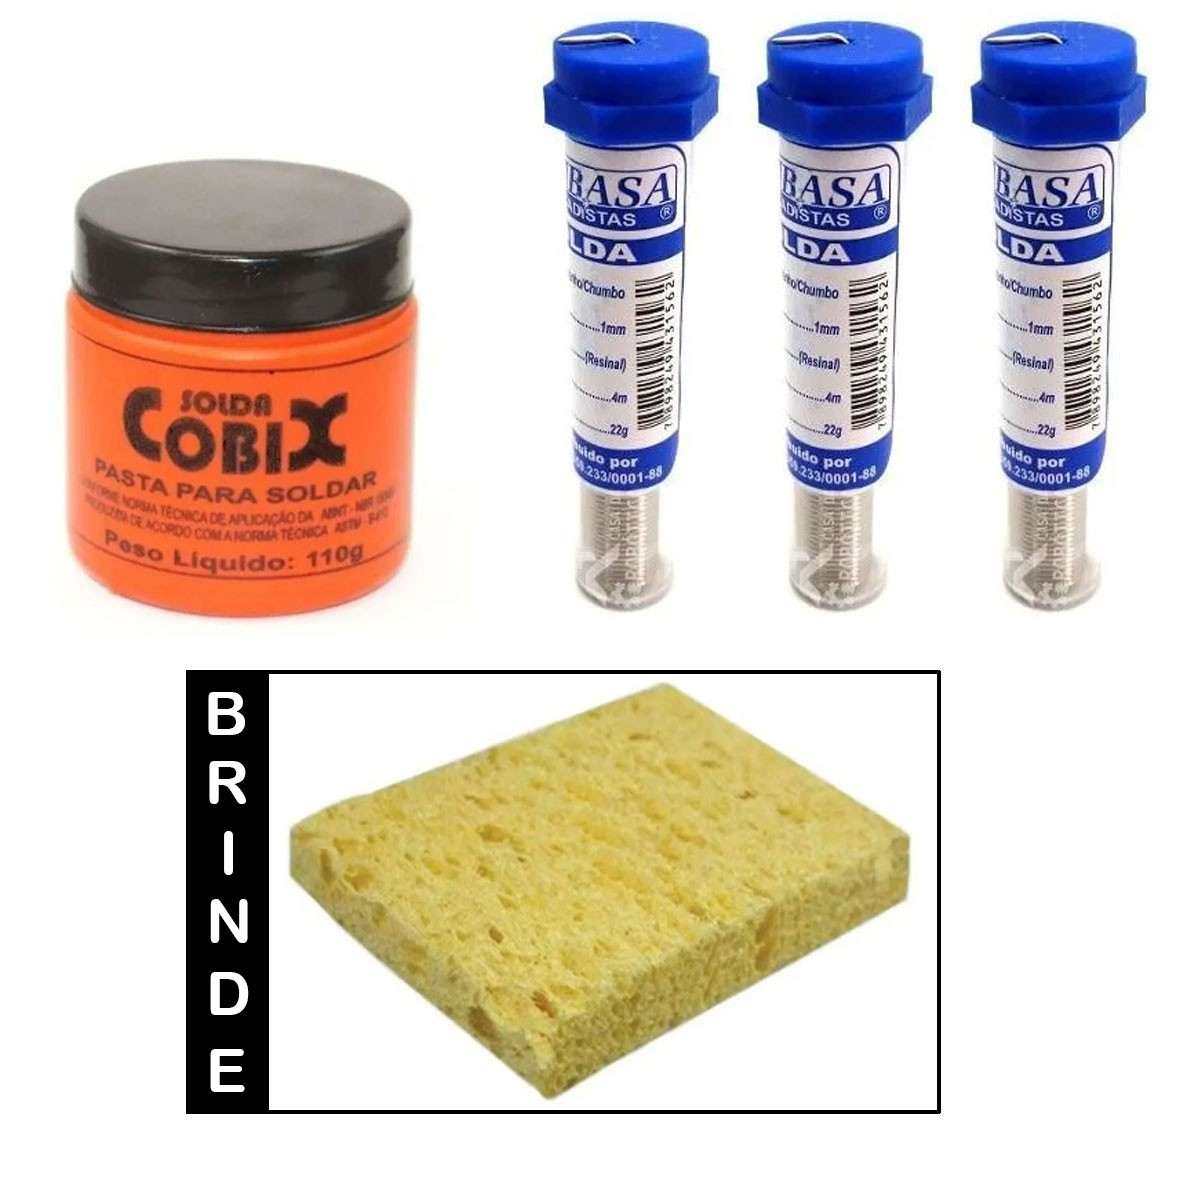 Combo: Pasta de Solda Cobix + 3 Tubo de Solda de Estanho + Brinde (Esponja)